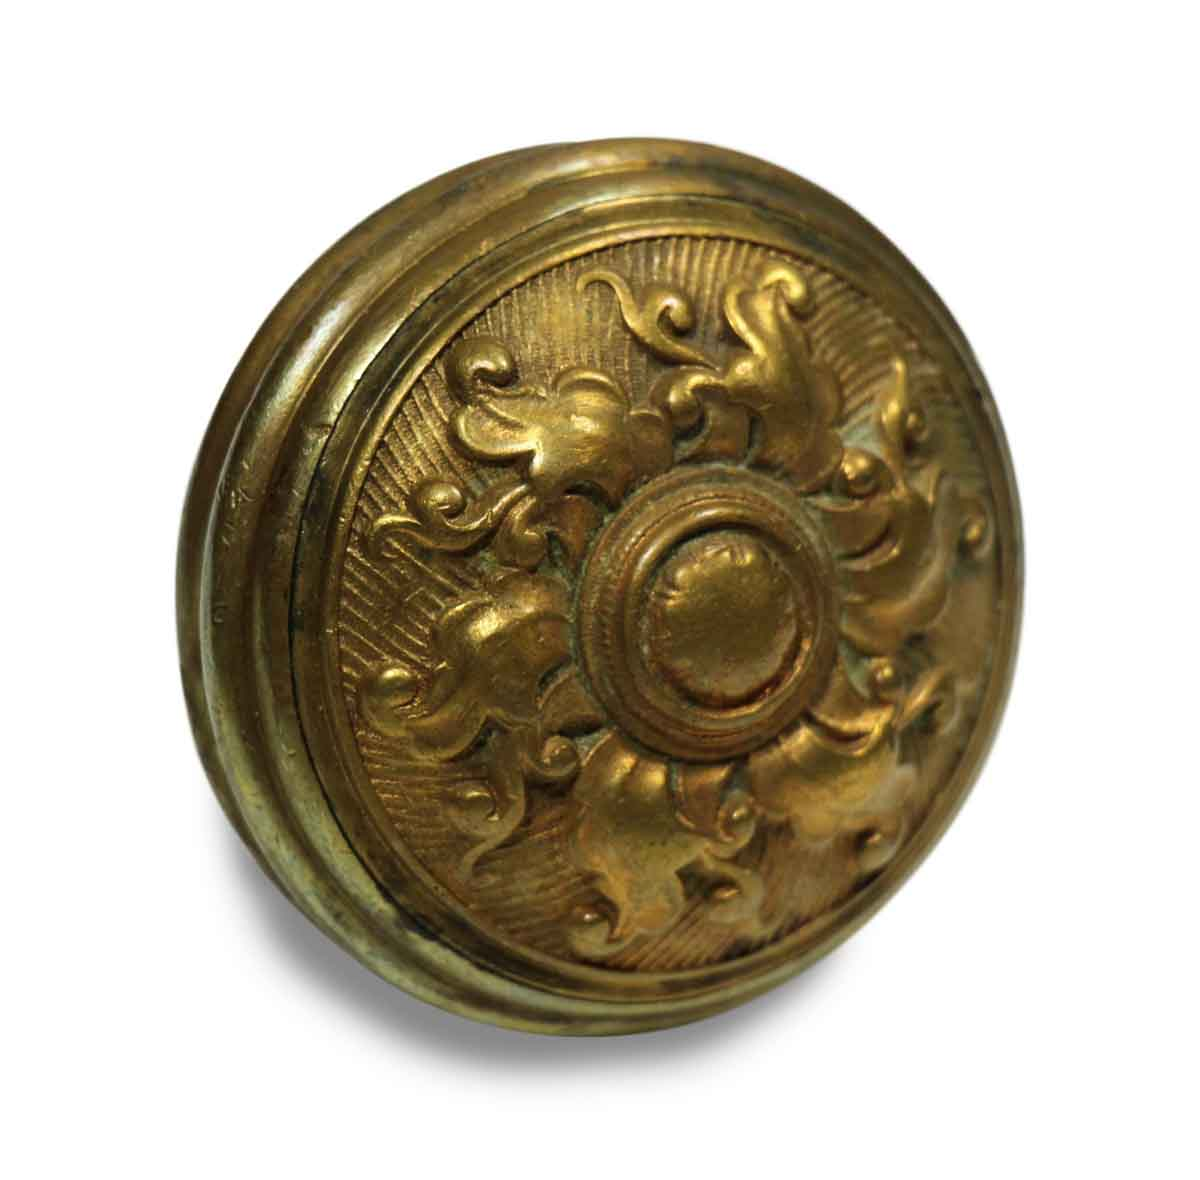 Antique Six Fold Spiral Bronze Ornate Door Knob Olde